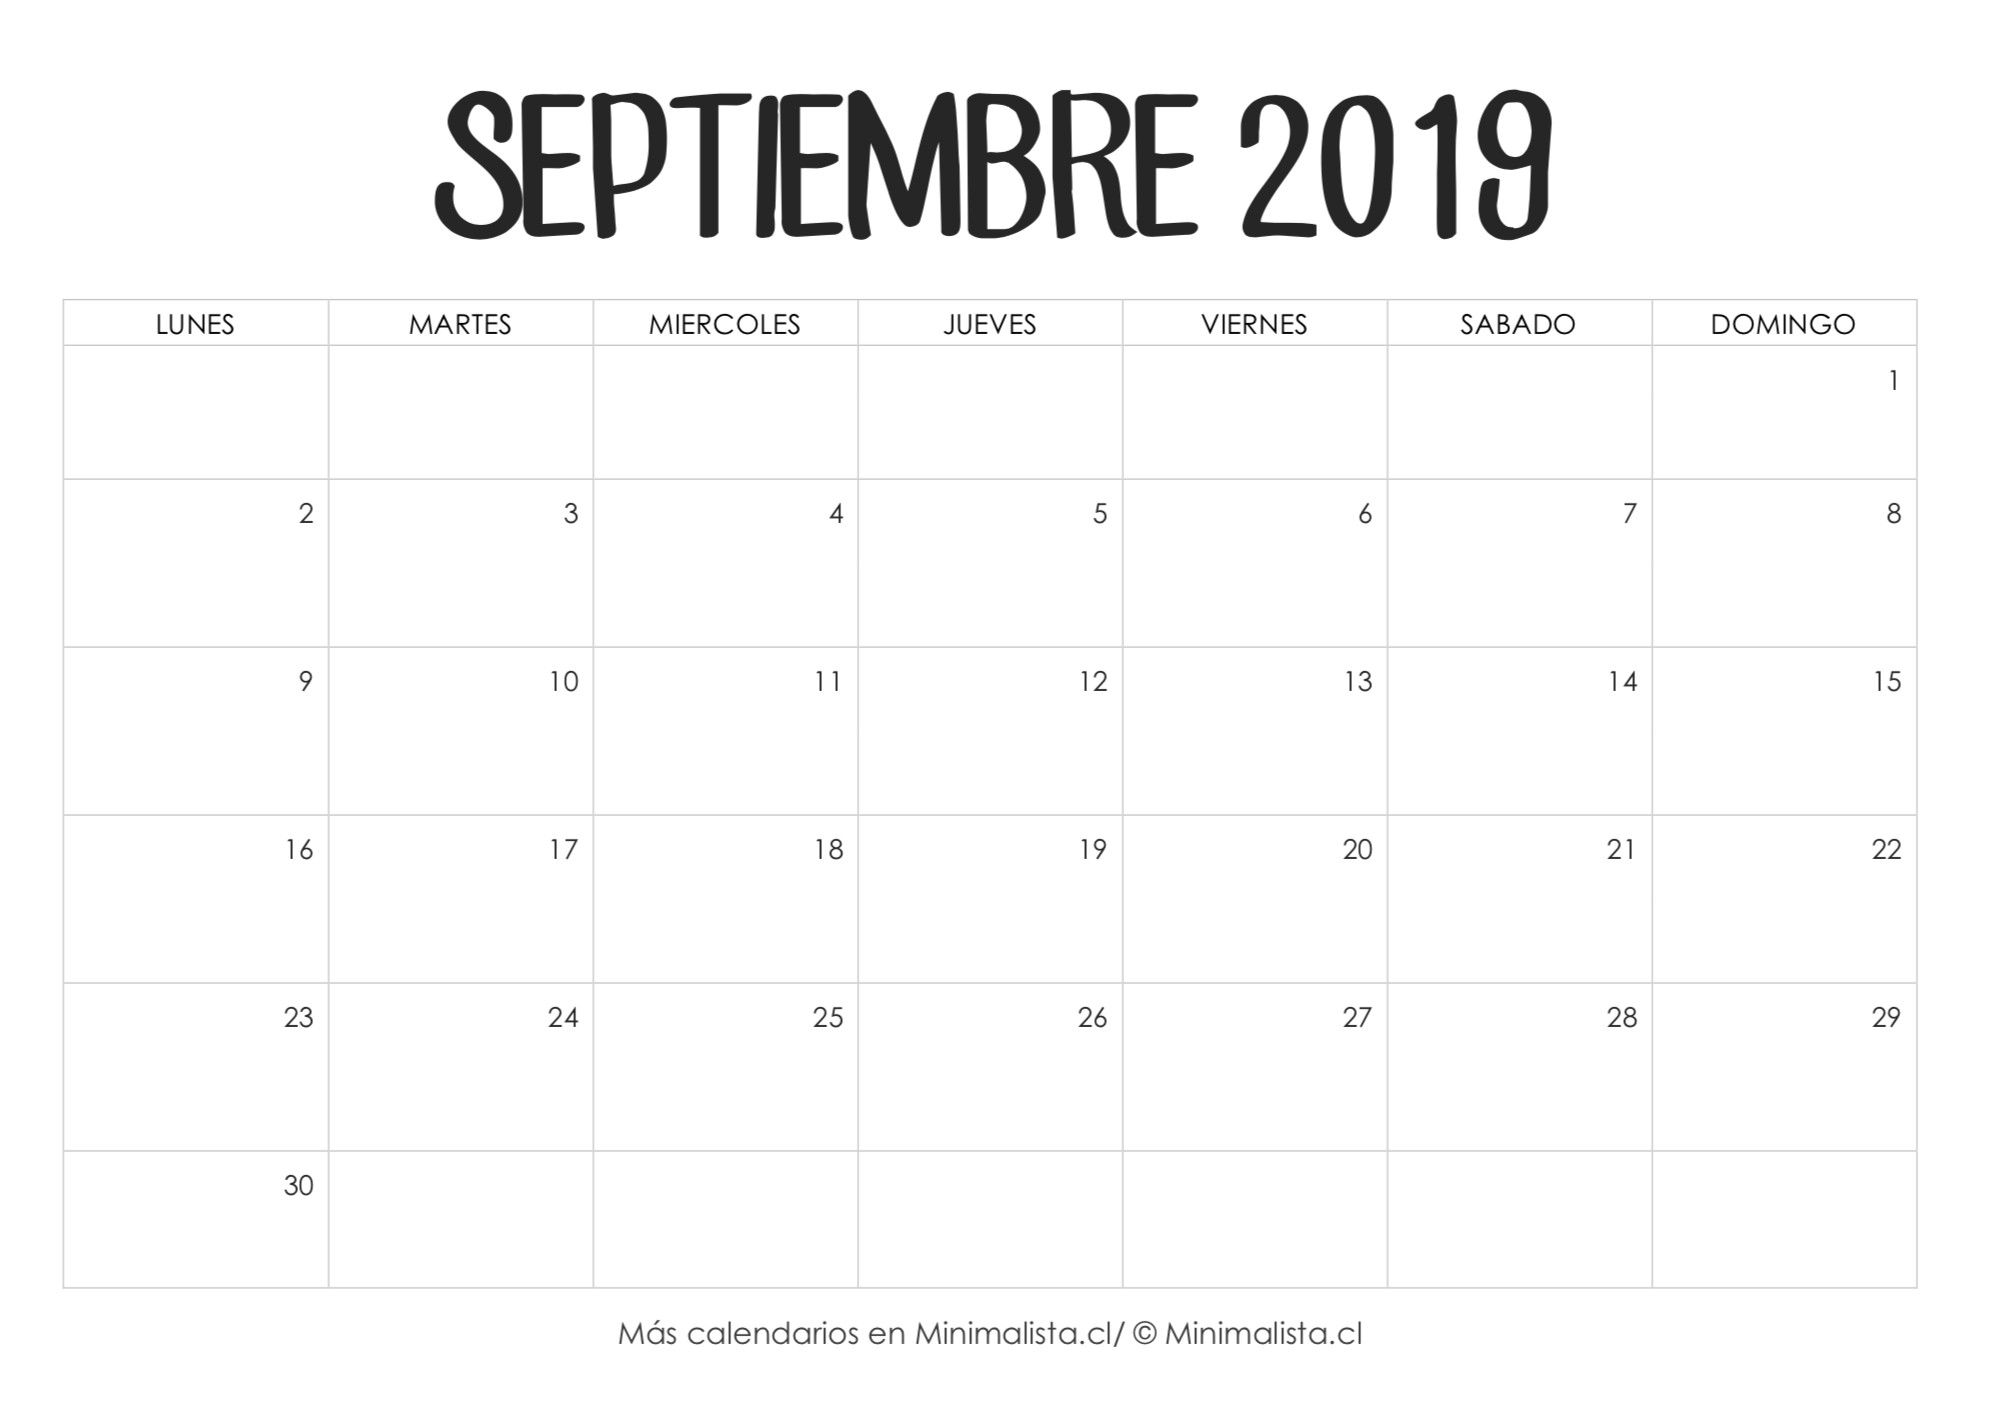 Calendarios para imprimir minimalista png 1990x1420 Calendario 2019 para imprimir por mes